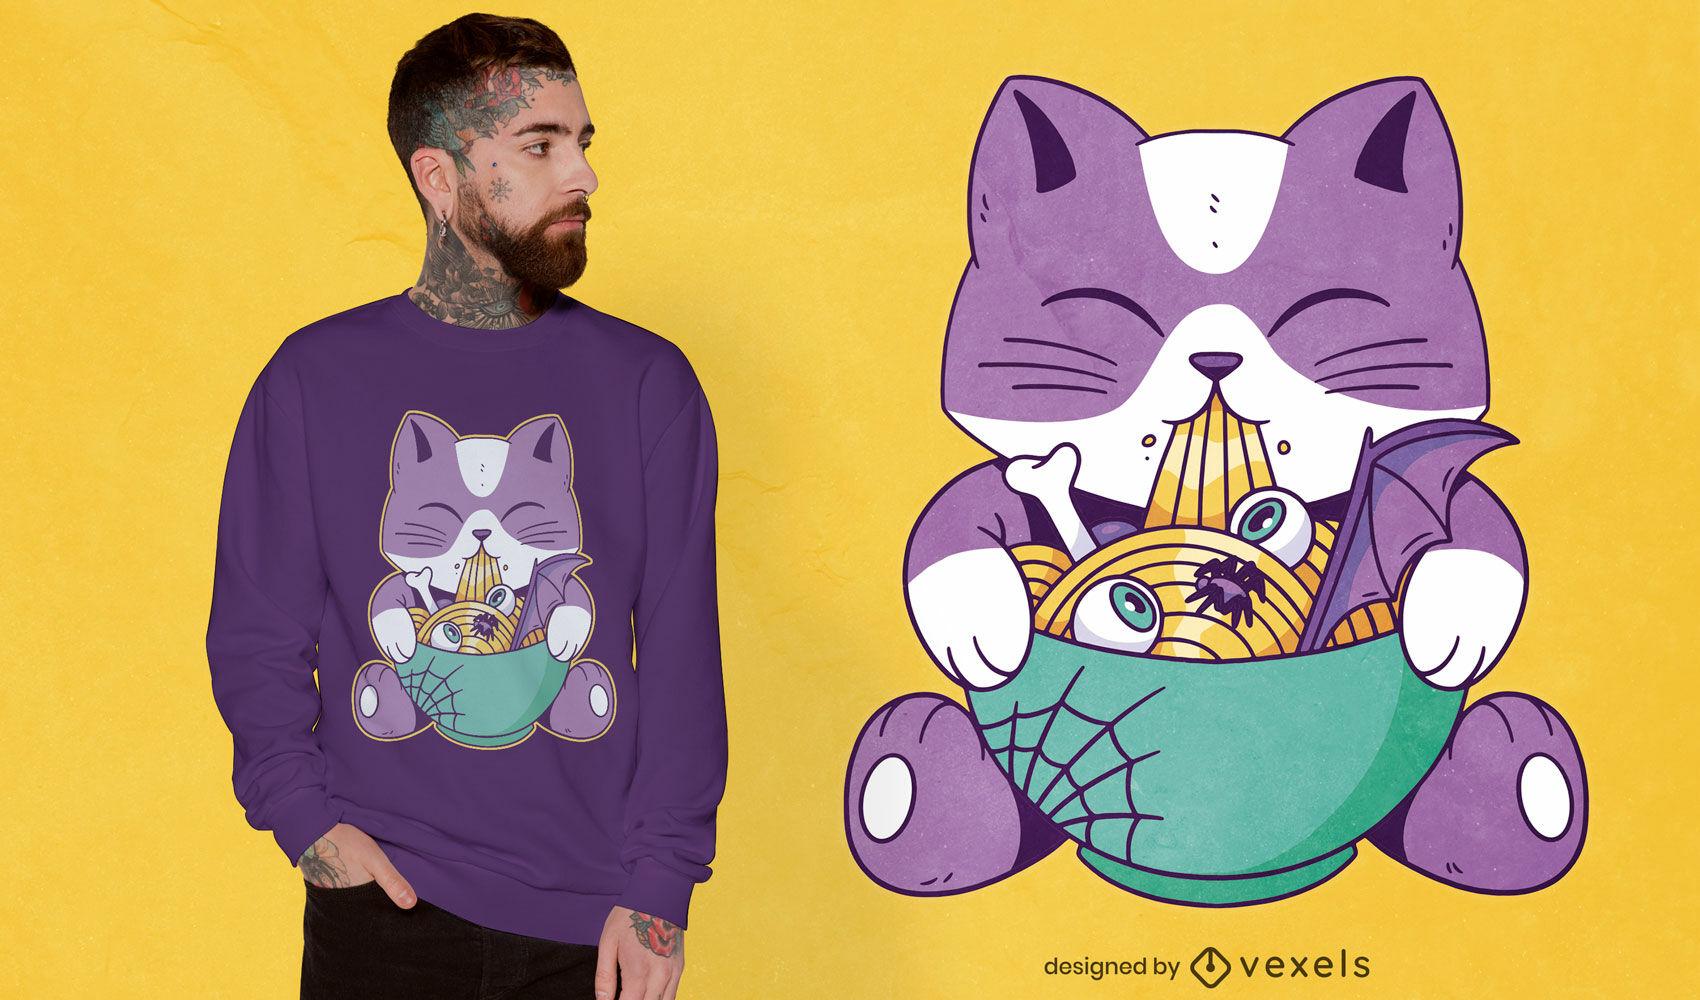 Lindo gato comiendo diseño de camiseta de ramen de halloween